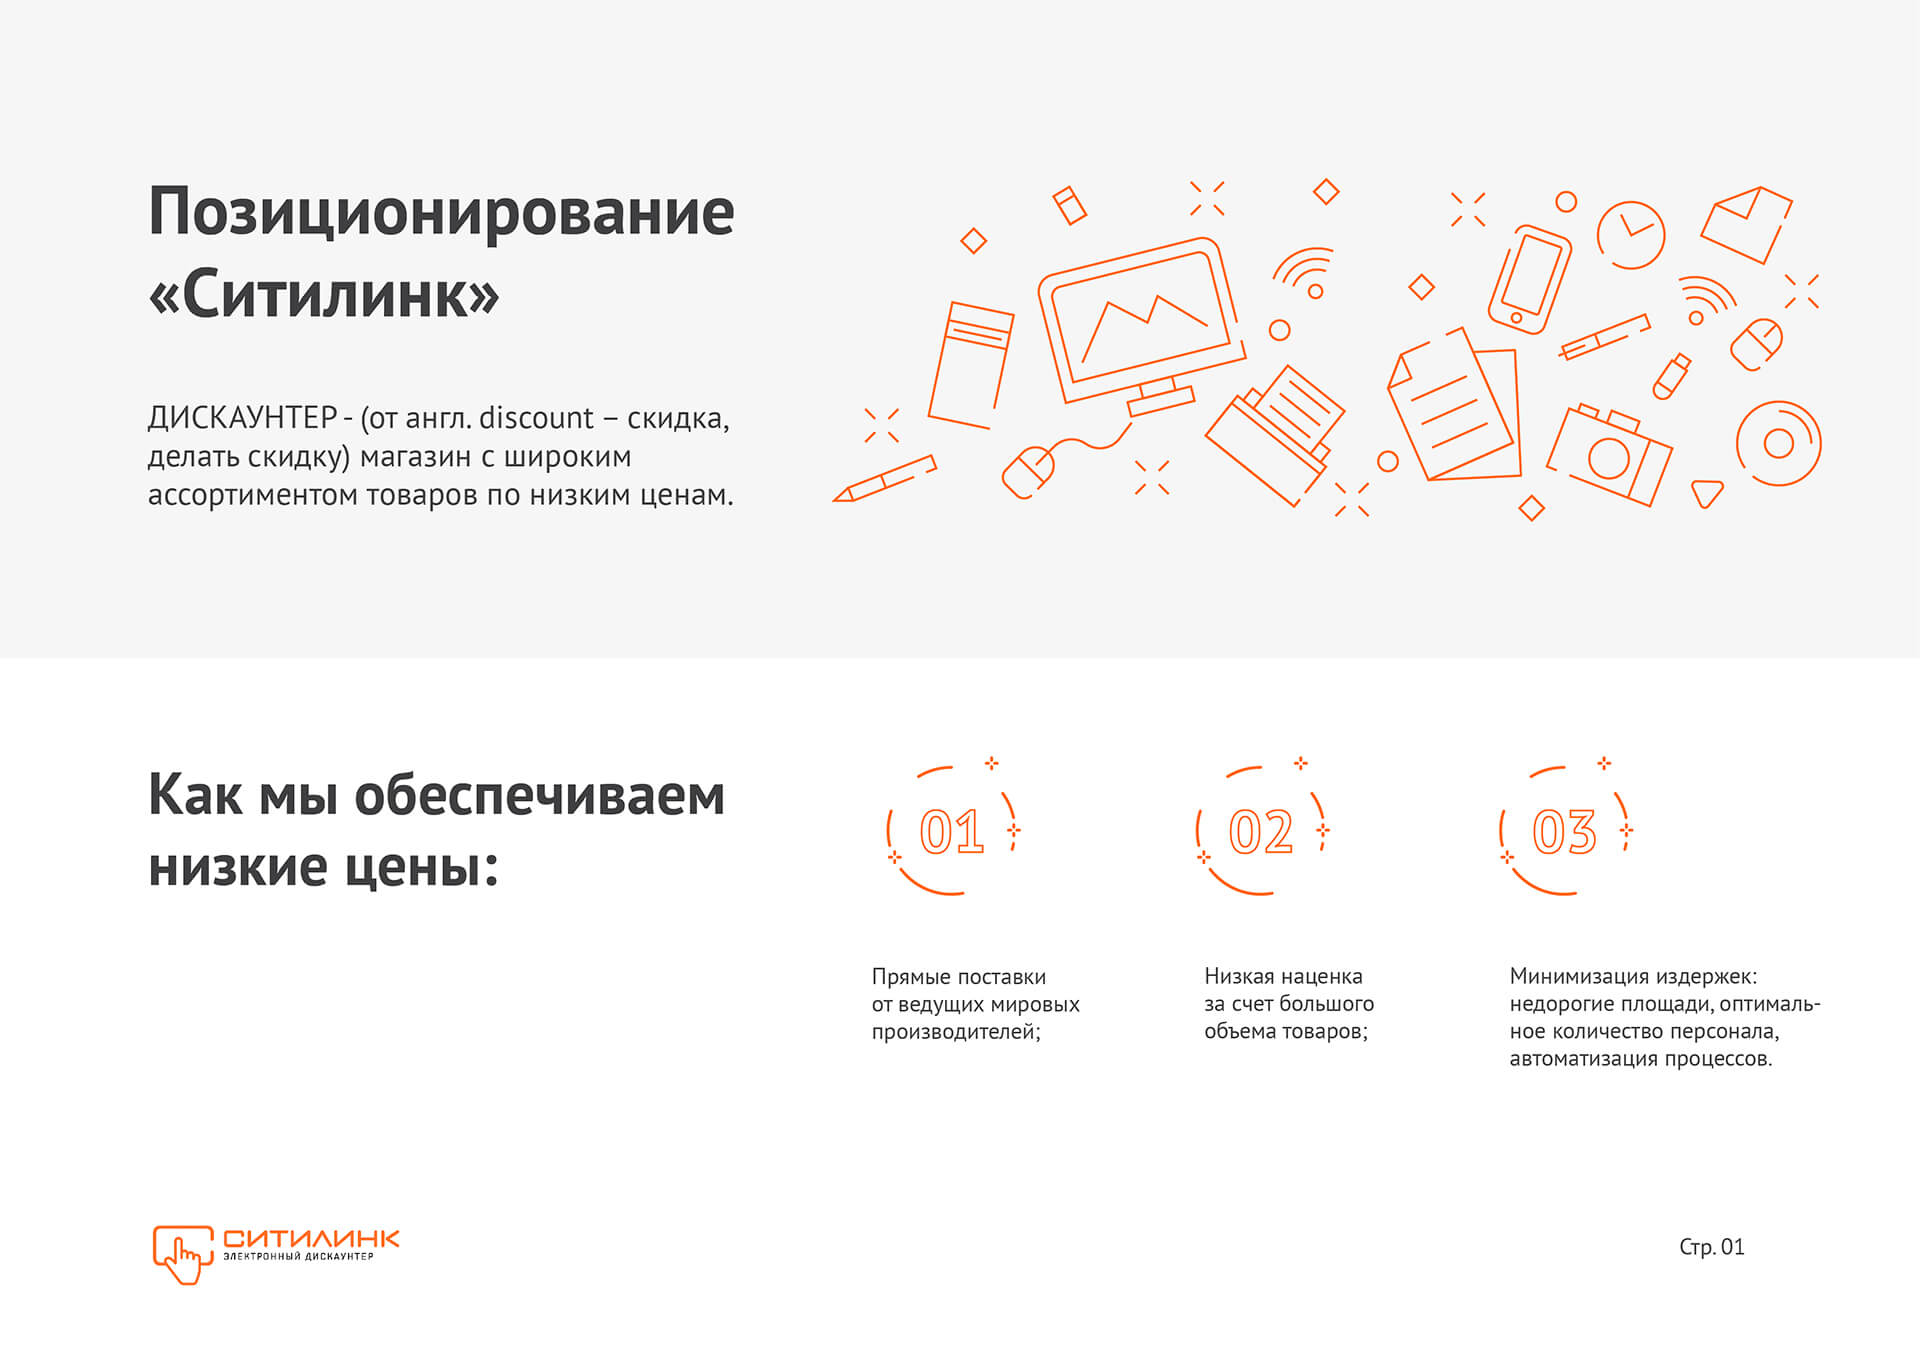 Презентация Ситилинк — Citilink | Разработка презентаций под заказ